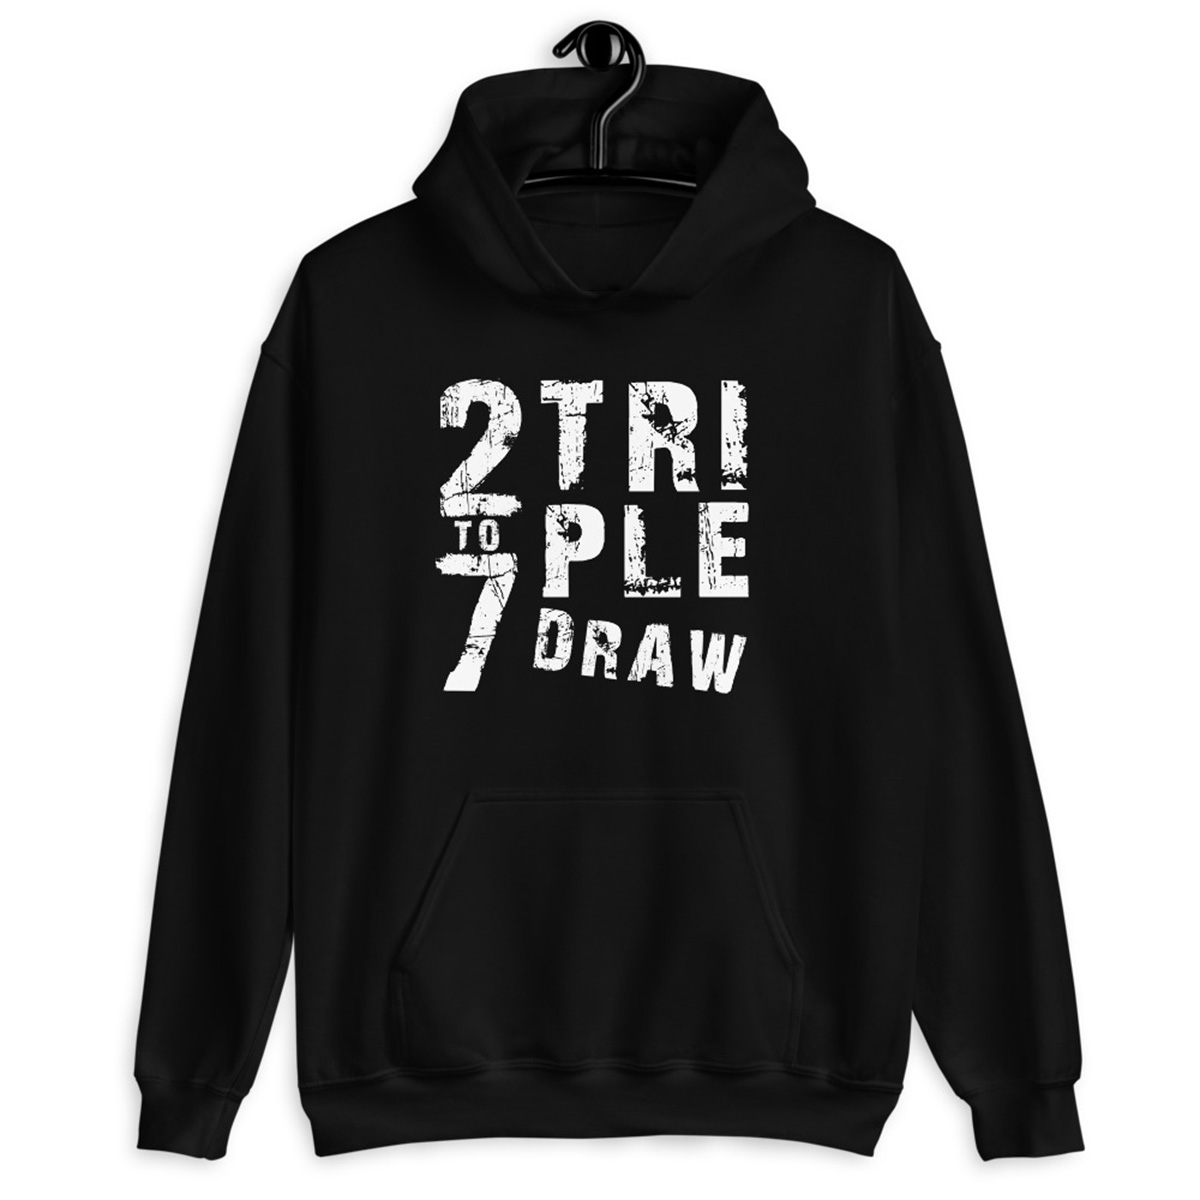 2 To 7 Triple Draw Poker Hoodie-Black